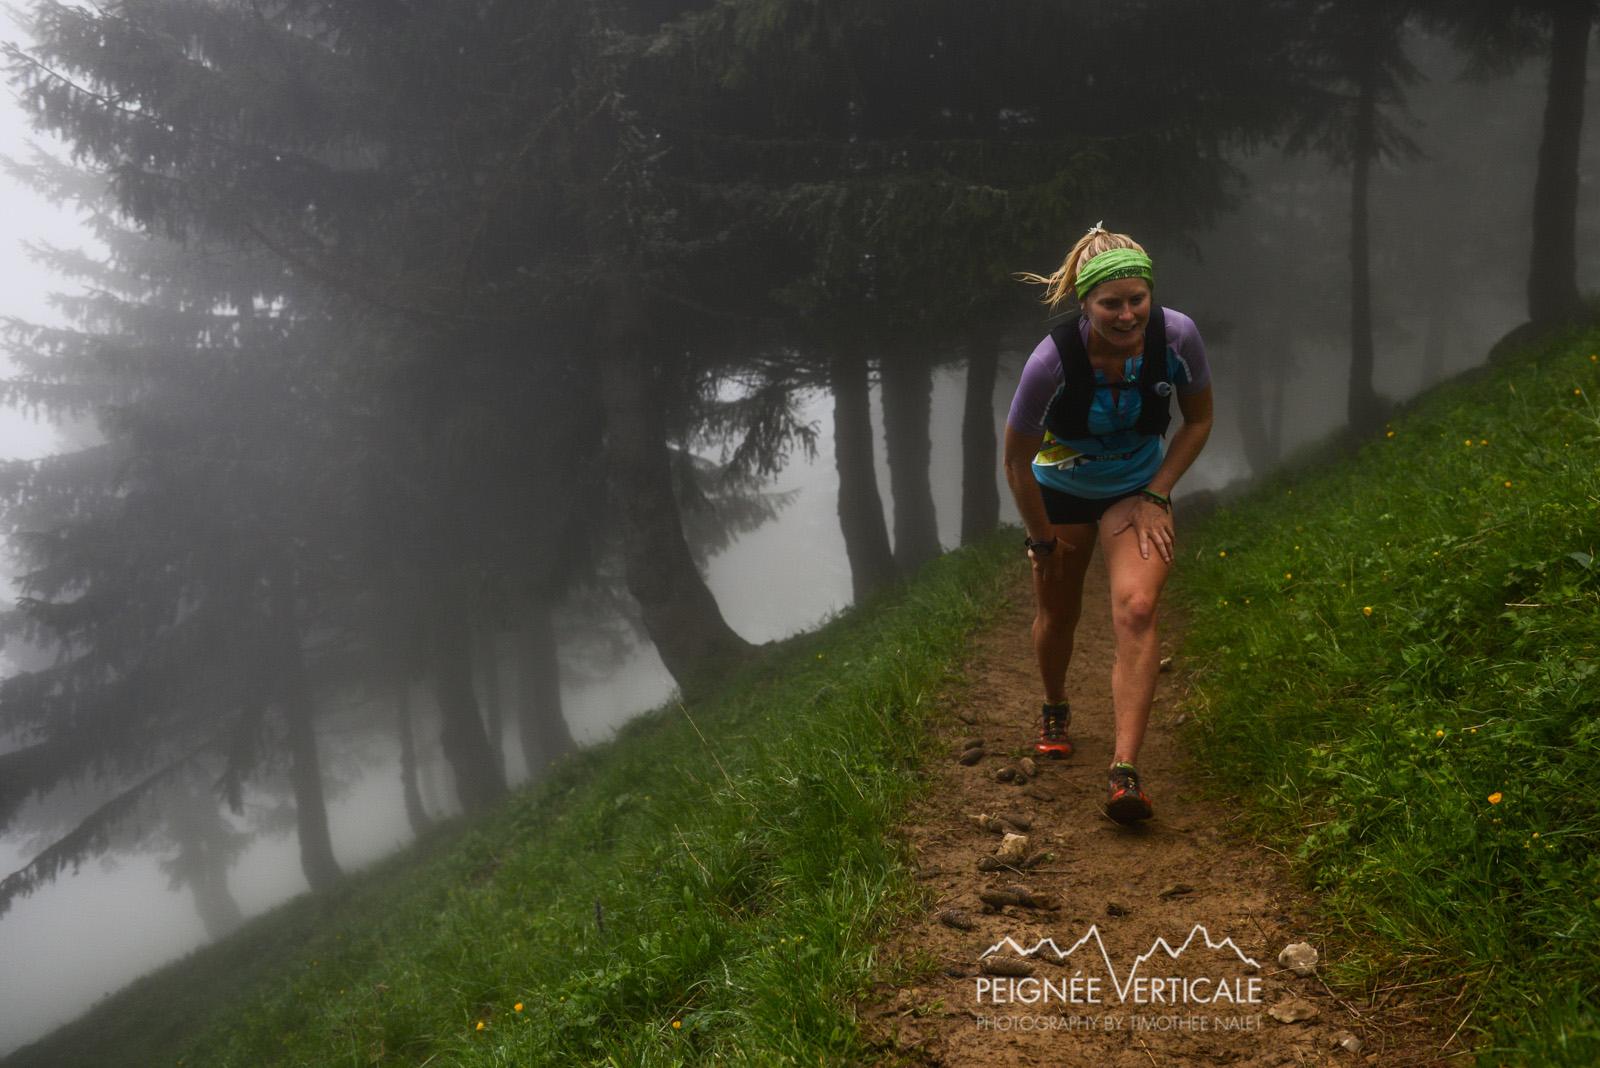 MaxiRace-Annecy-2014-A.Frost-Timothee-Nalet-1074.jpg